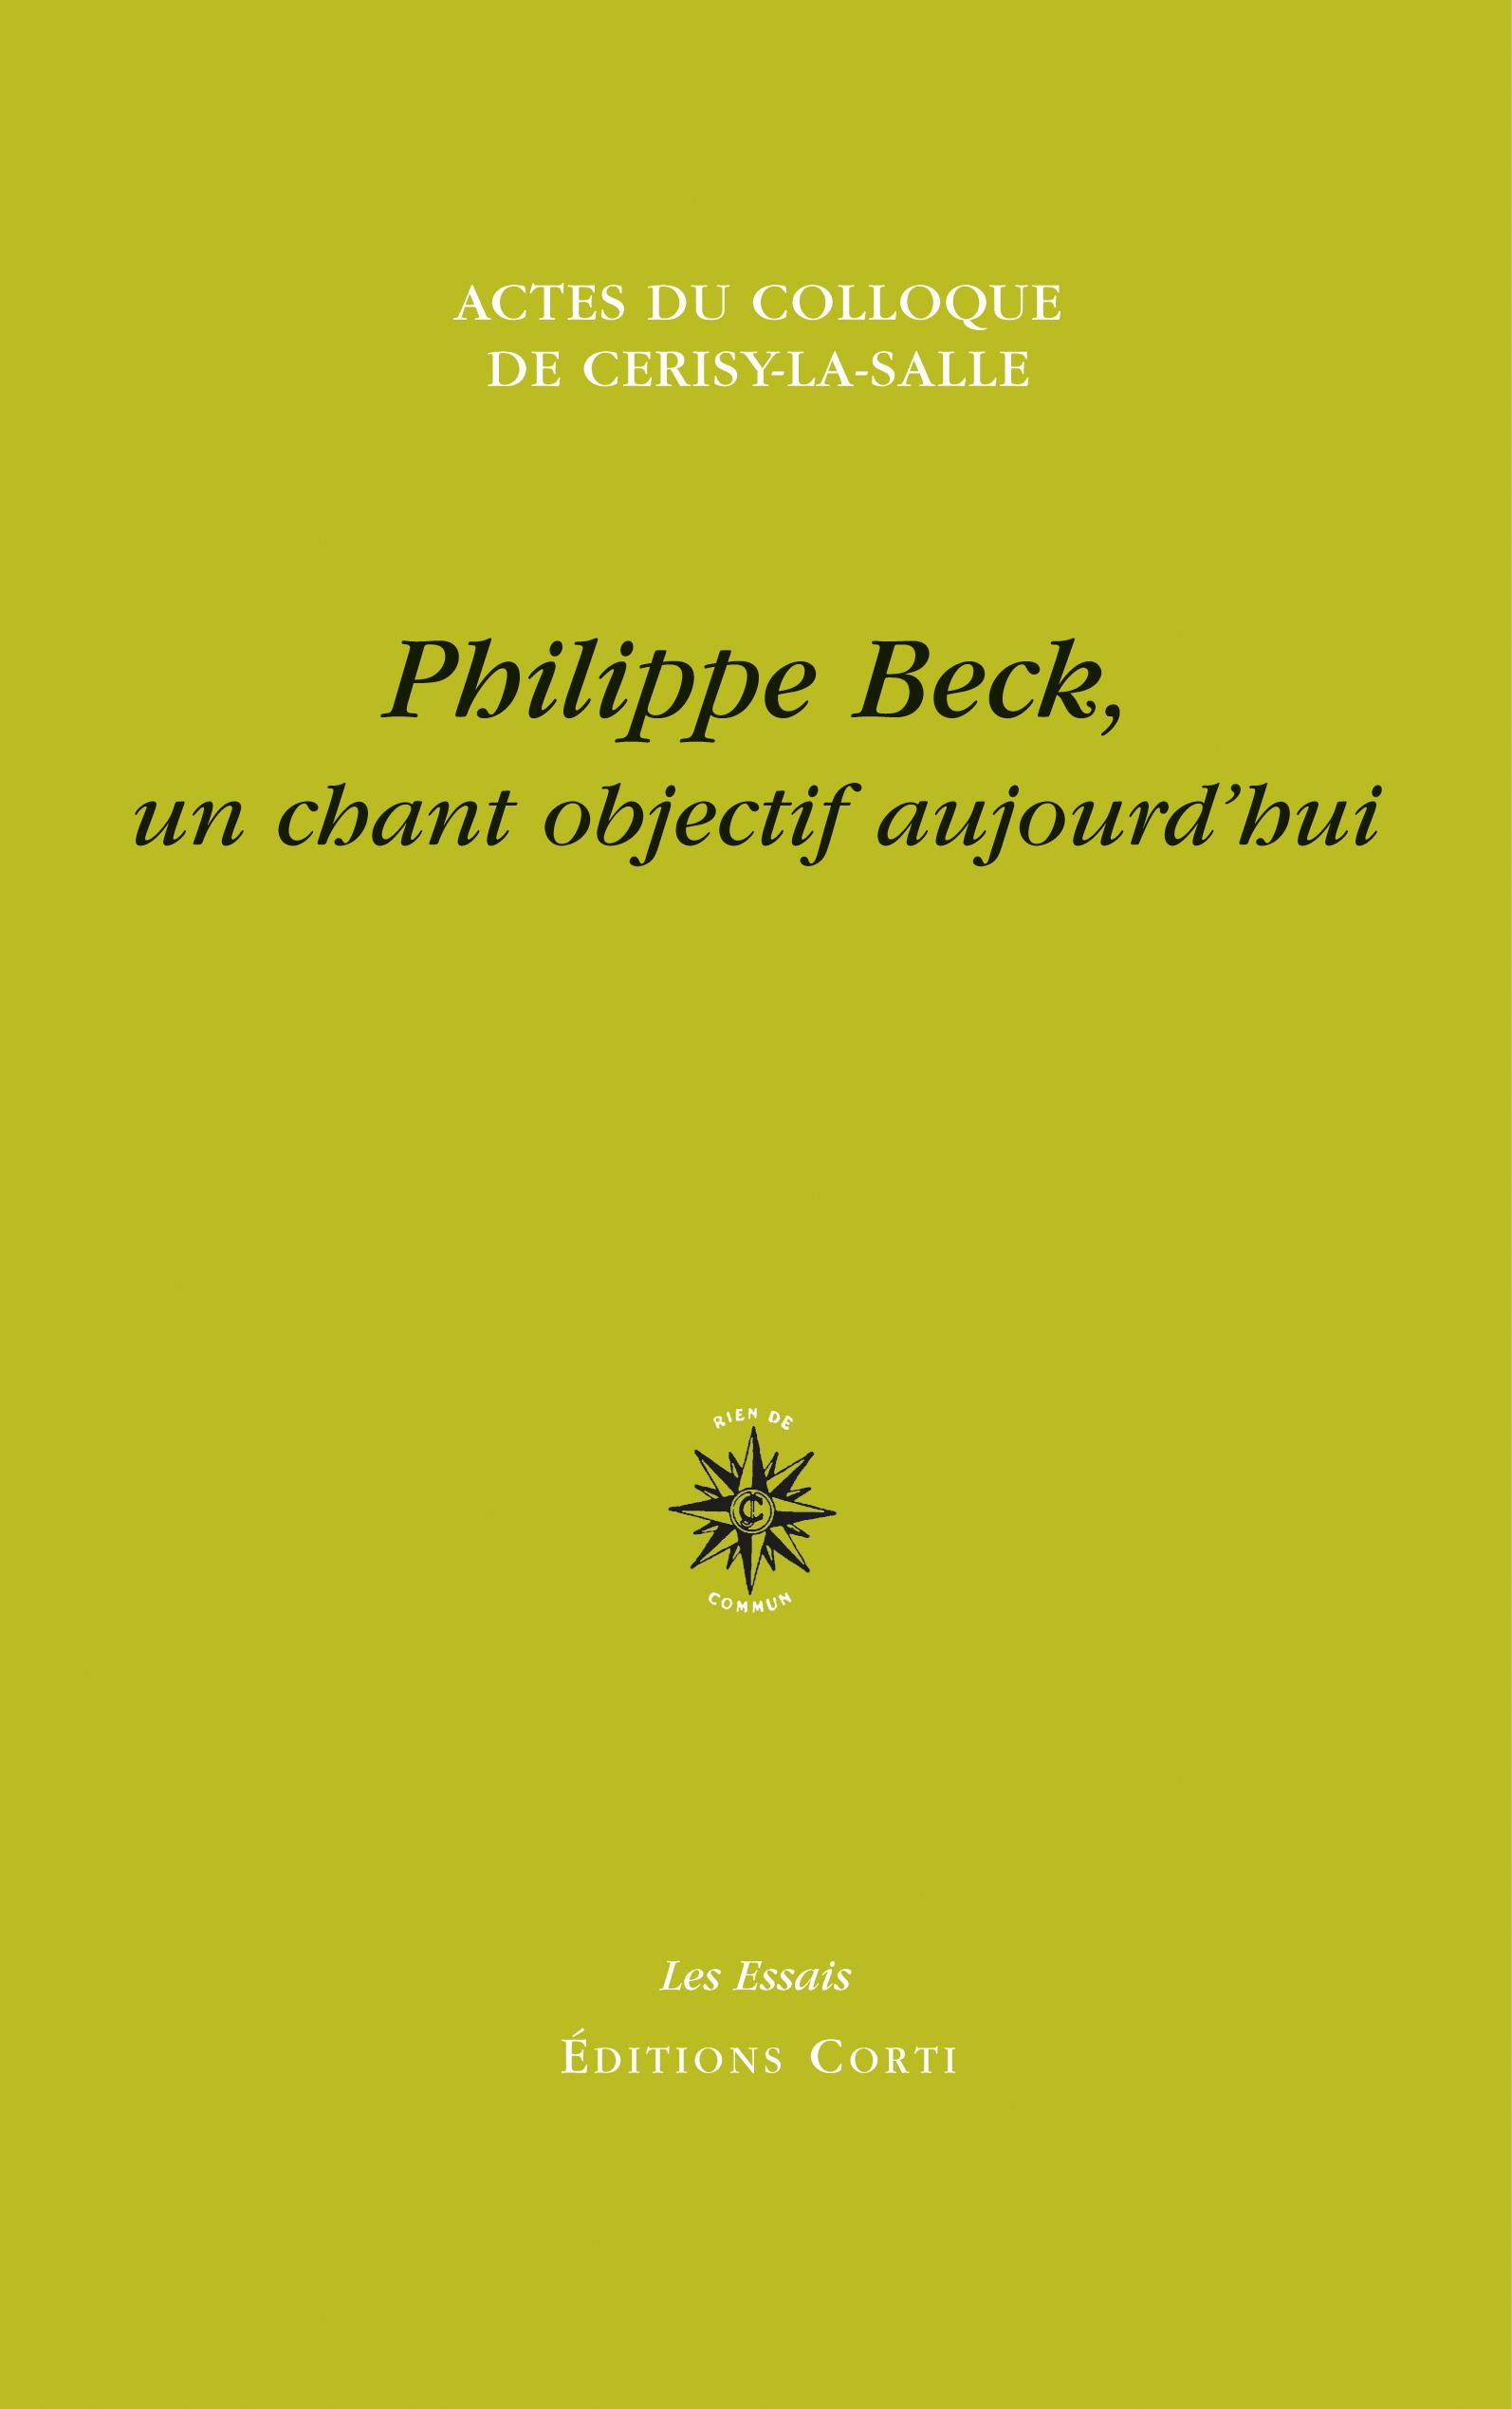 I. Barberis & G. Tesson (dir.), Philippe Beck, un chant objectif aujourd'hui